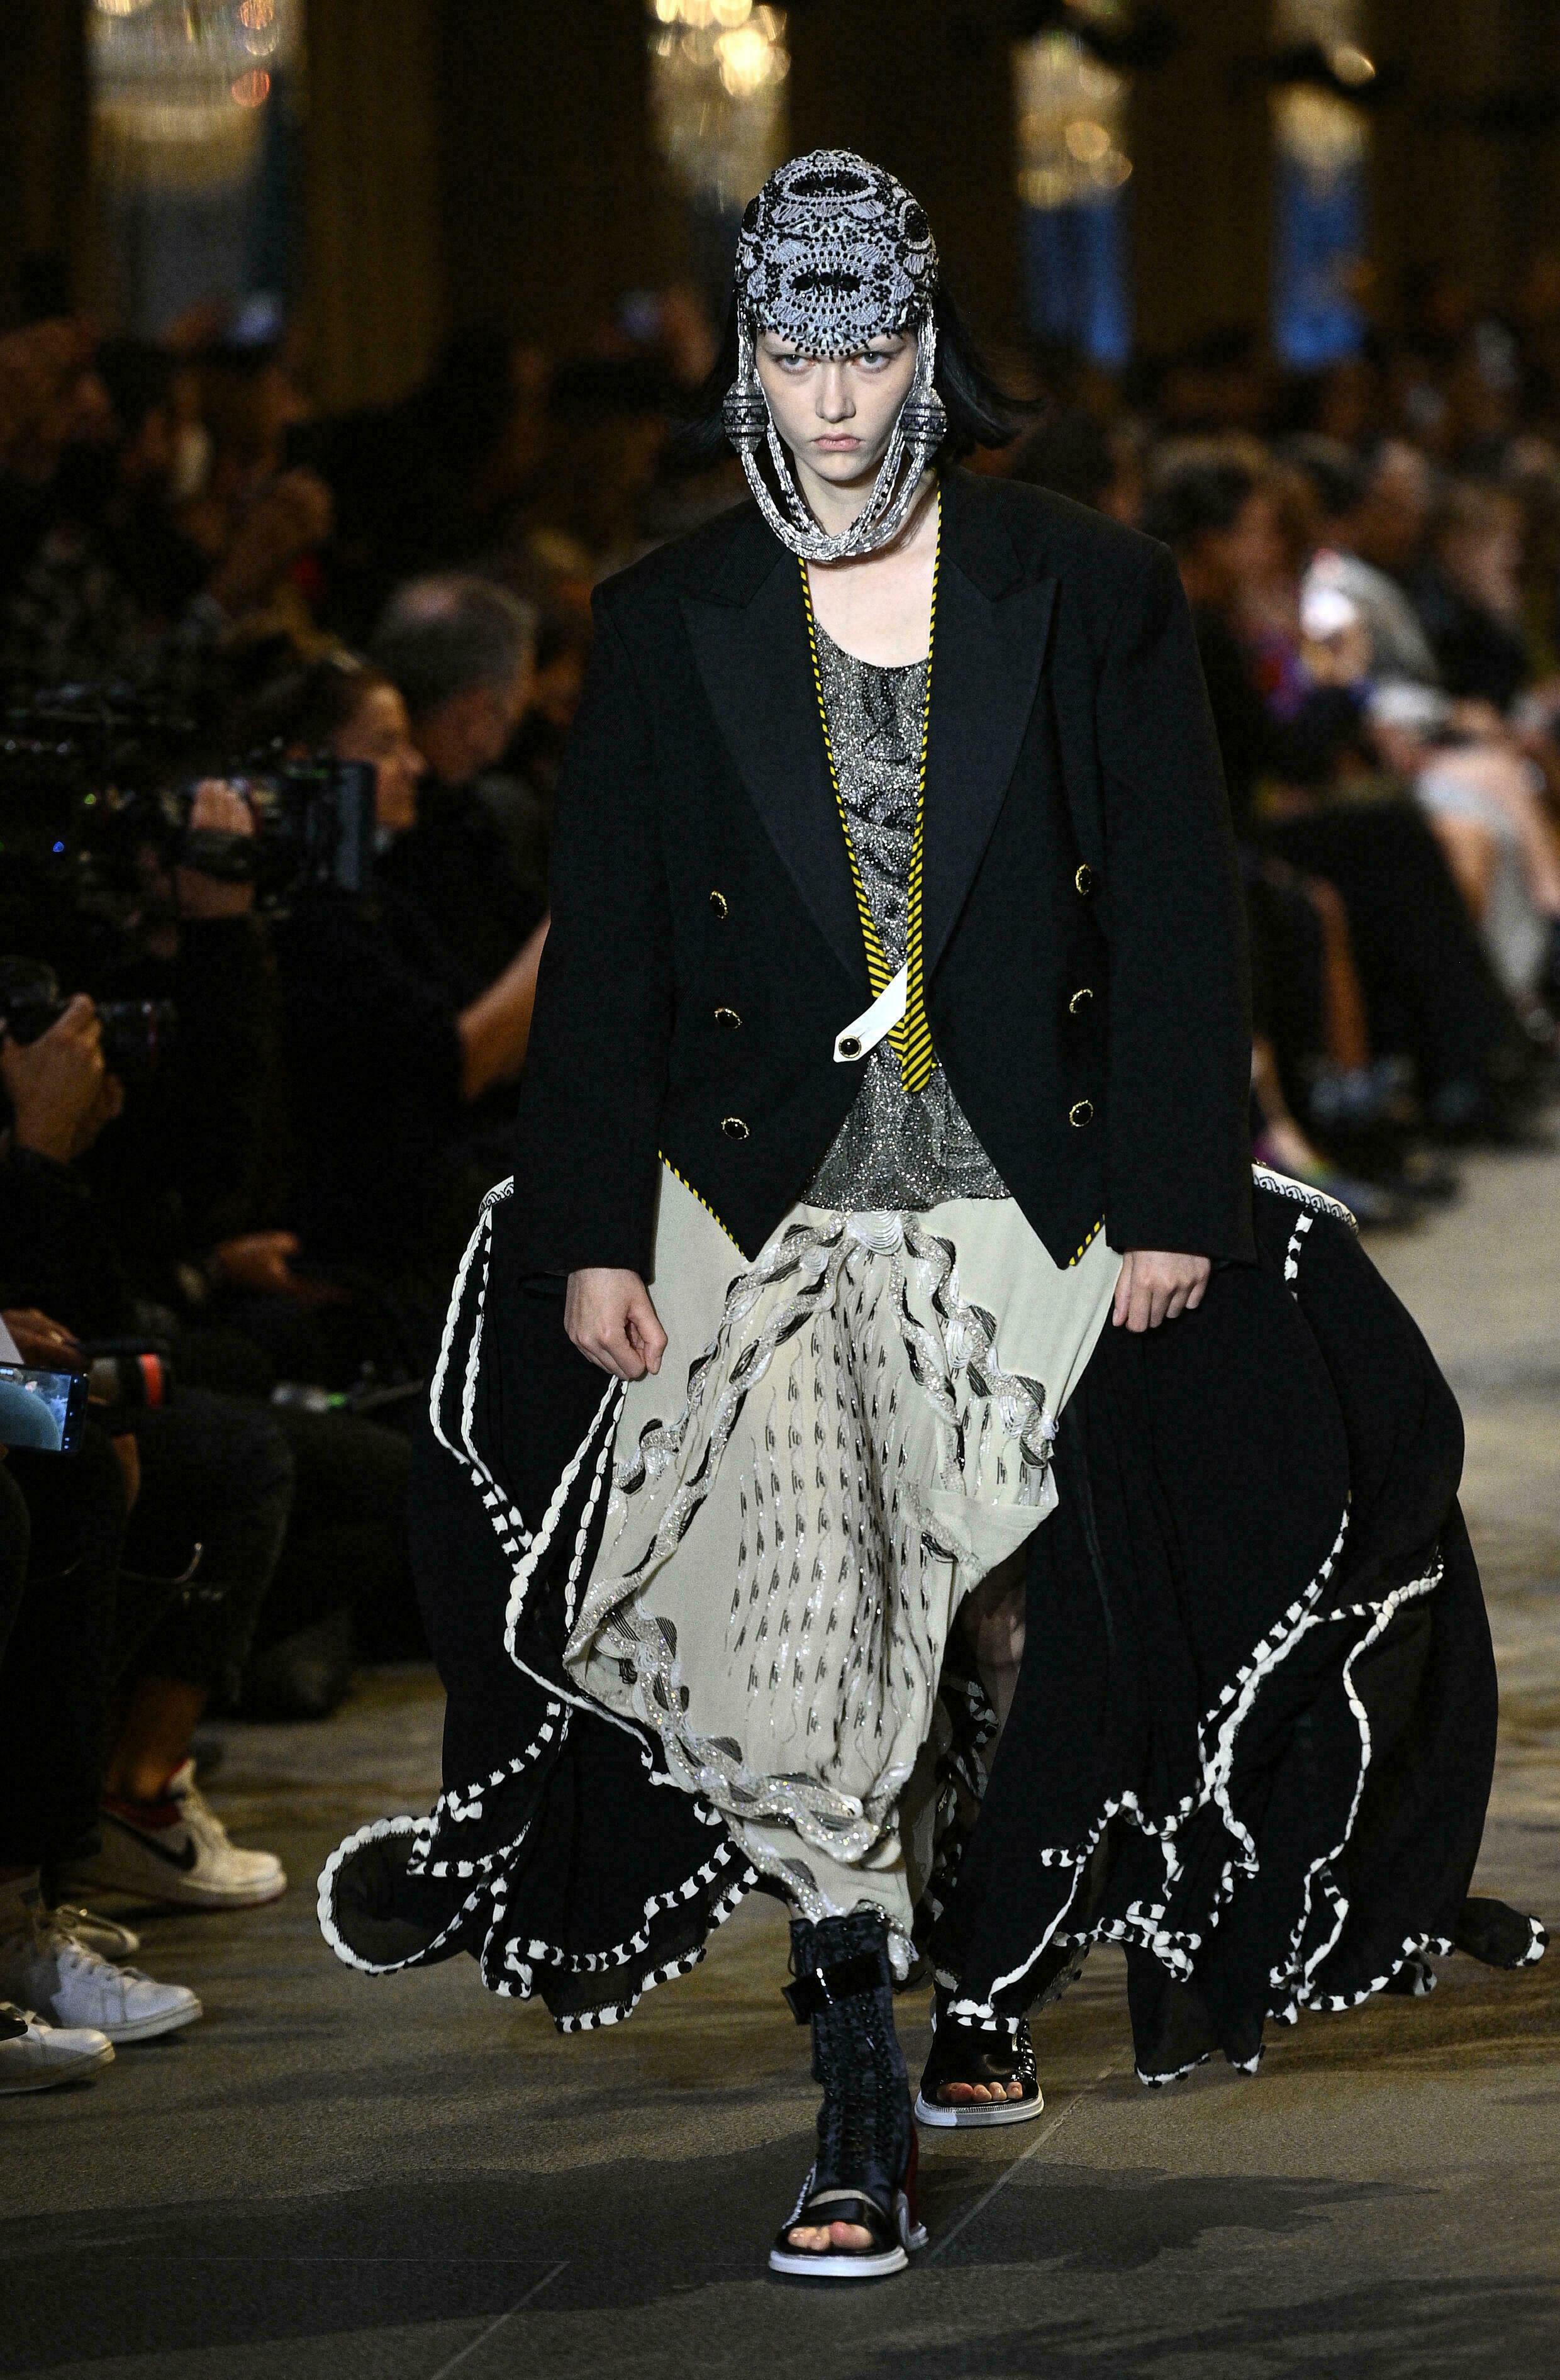 Louis Vuitton fashion show in Paris, October 5, 2021